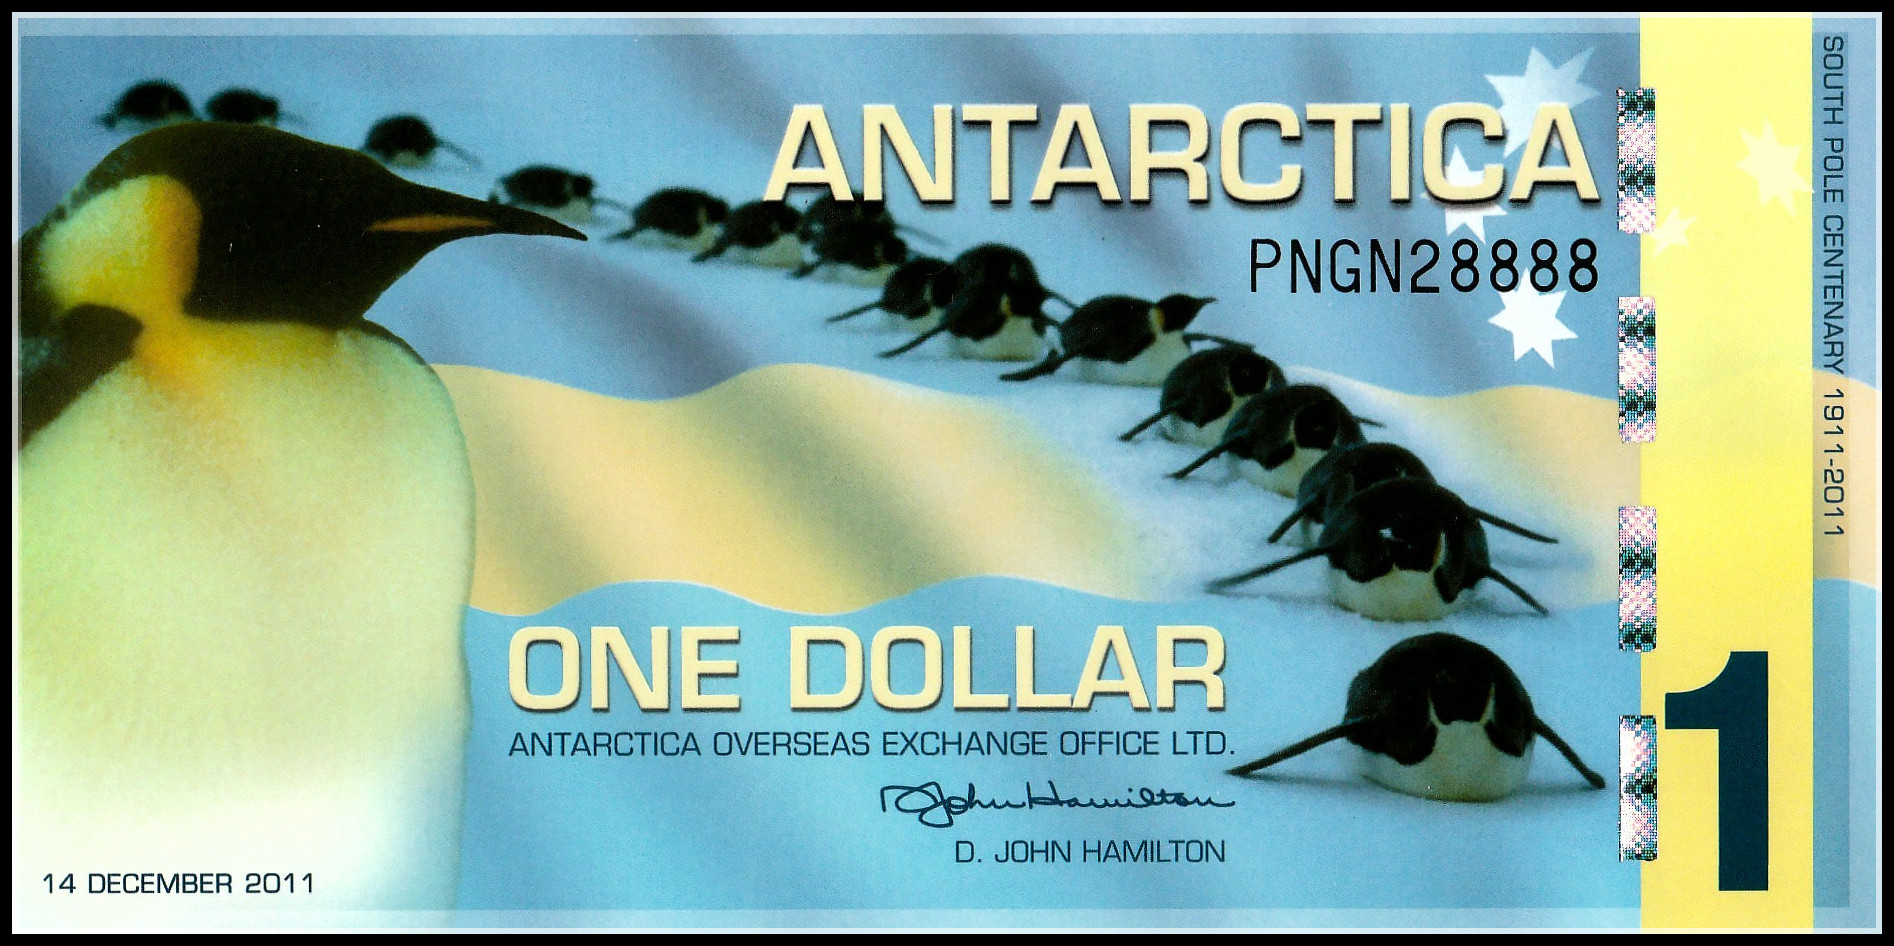 Антарктика, 1 доллар, пластиковая банкнота, 2011 оригинальная коллекция банкнот, оригинальные настоящие бумажные банкноты, купюр, банкноты, по...